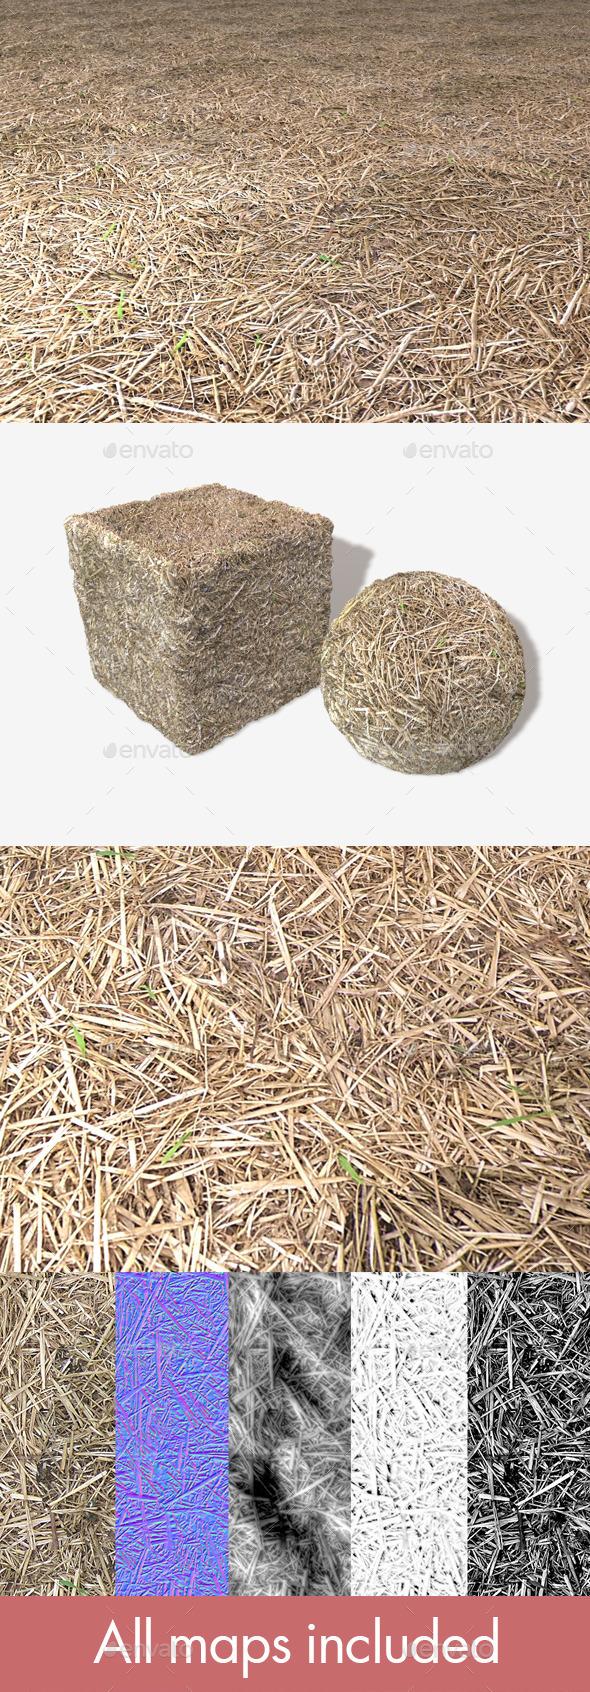 Straw Seamless Texture